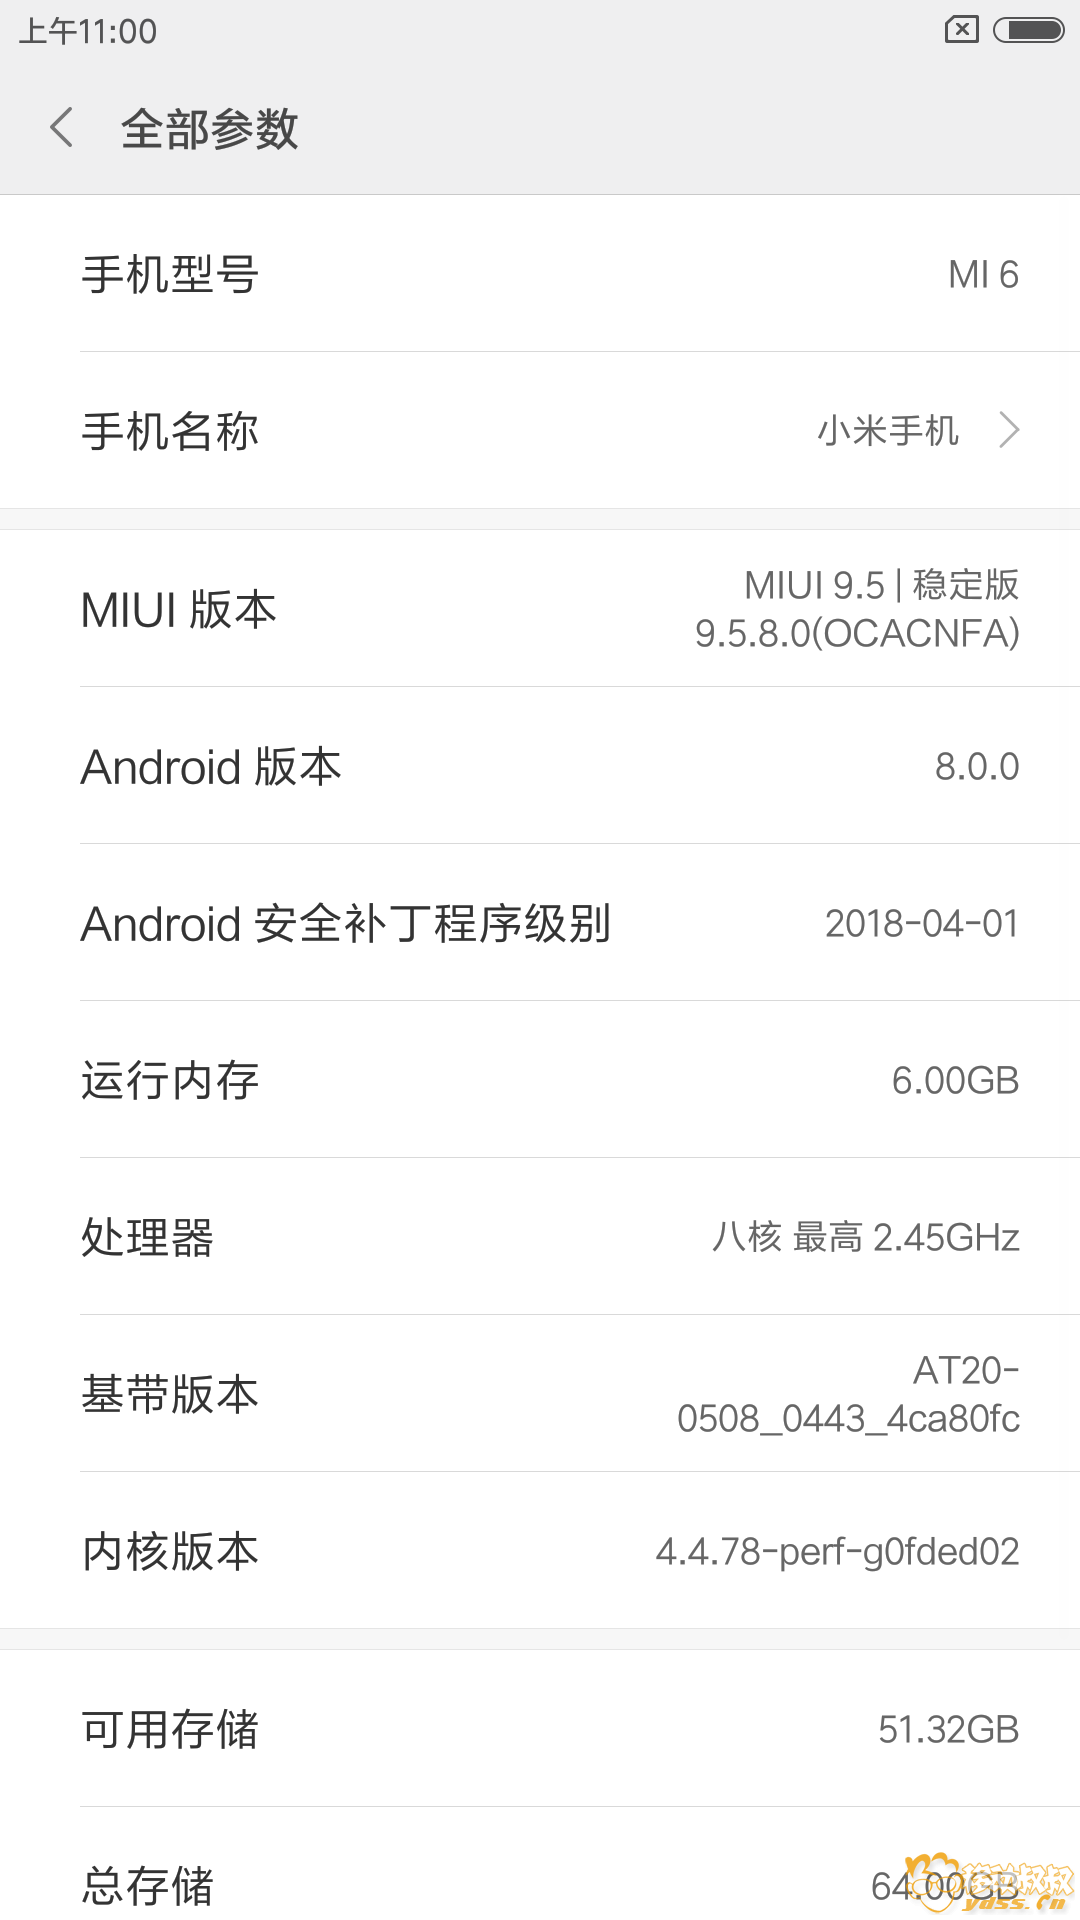 Screenshot_2018-06-06-11-00-29-204_com.android.settings.png